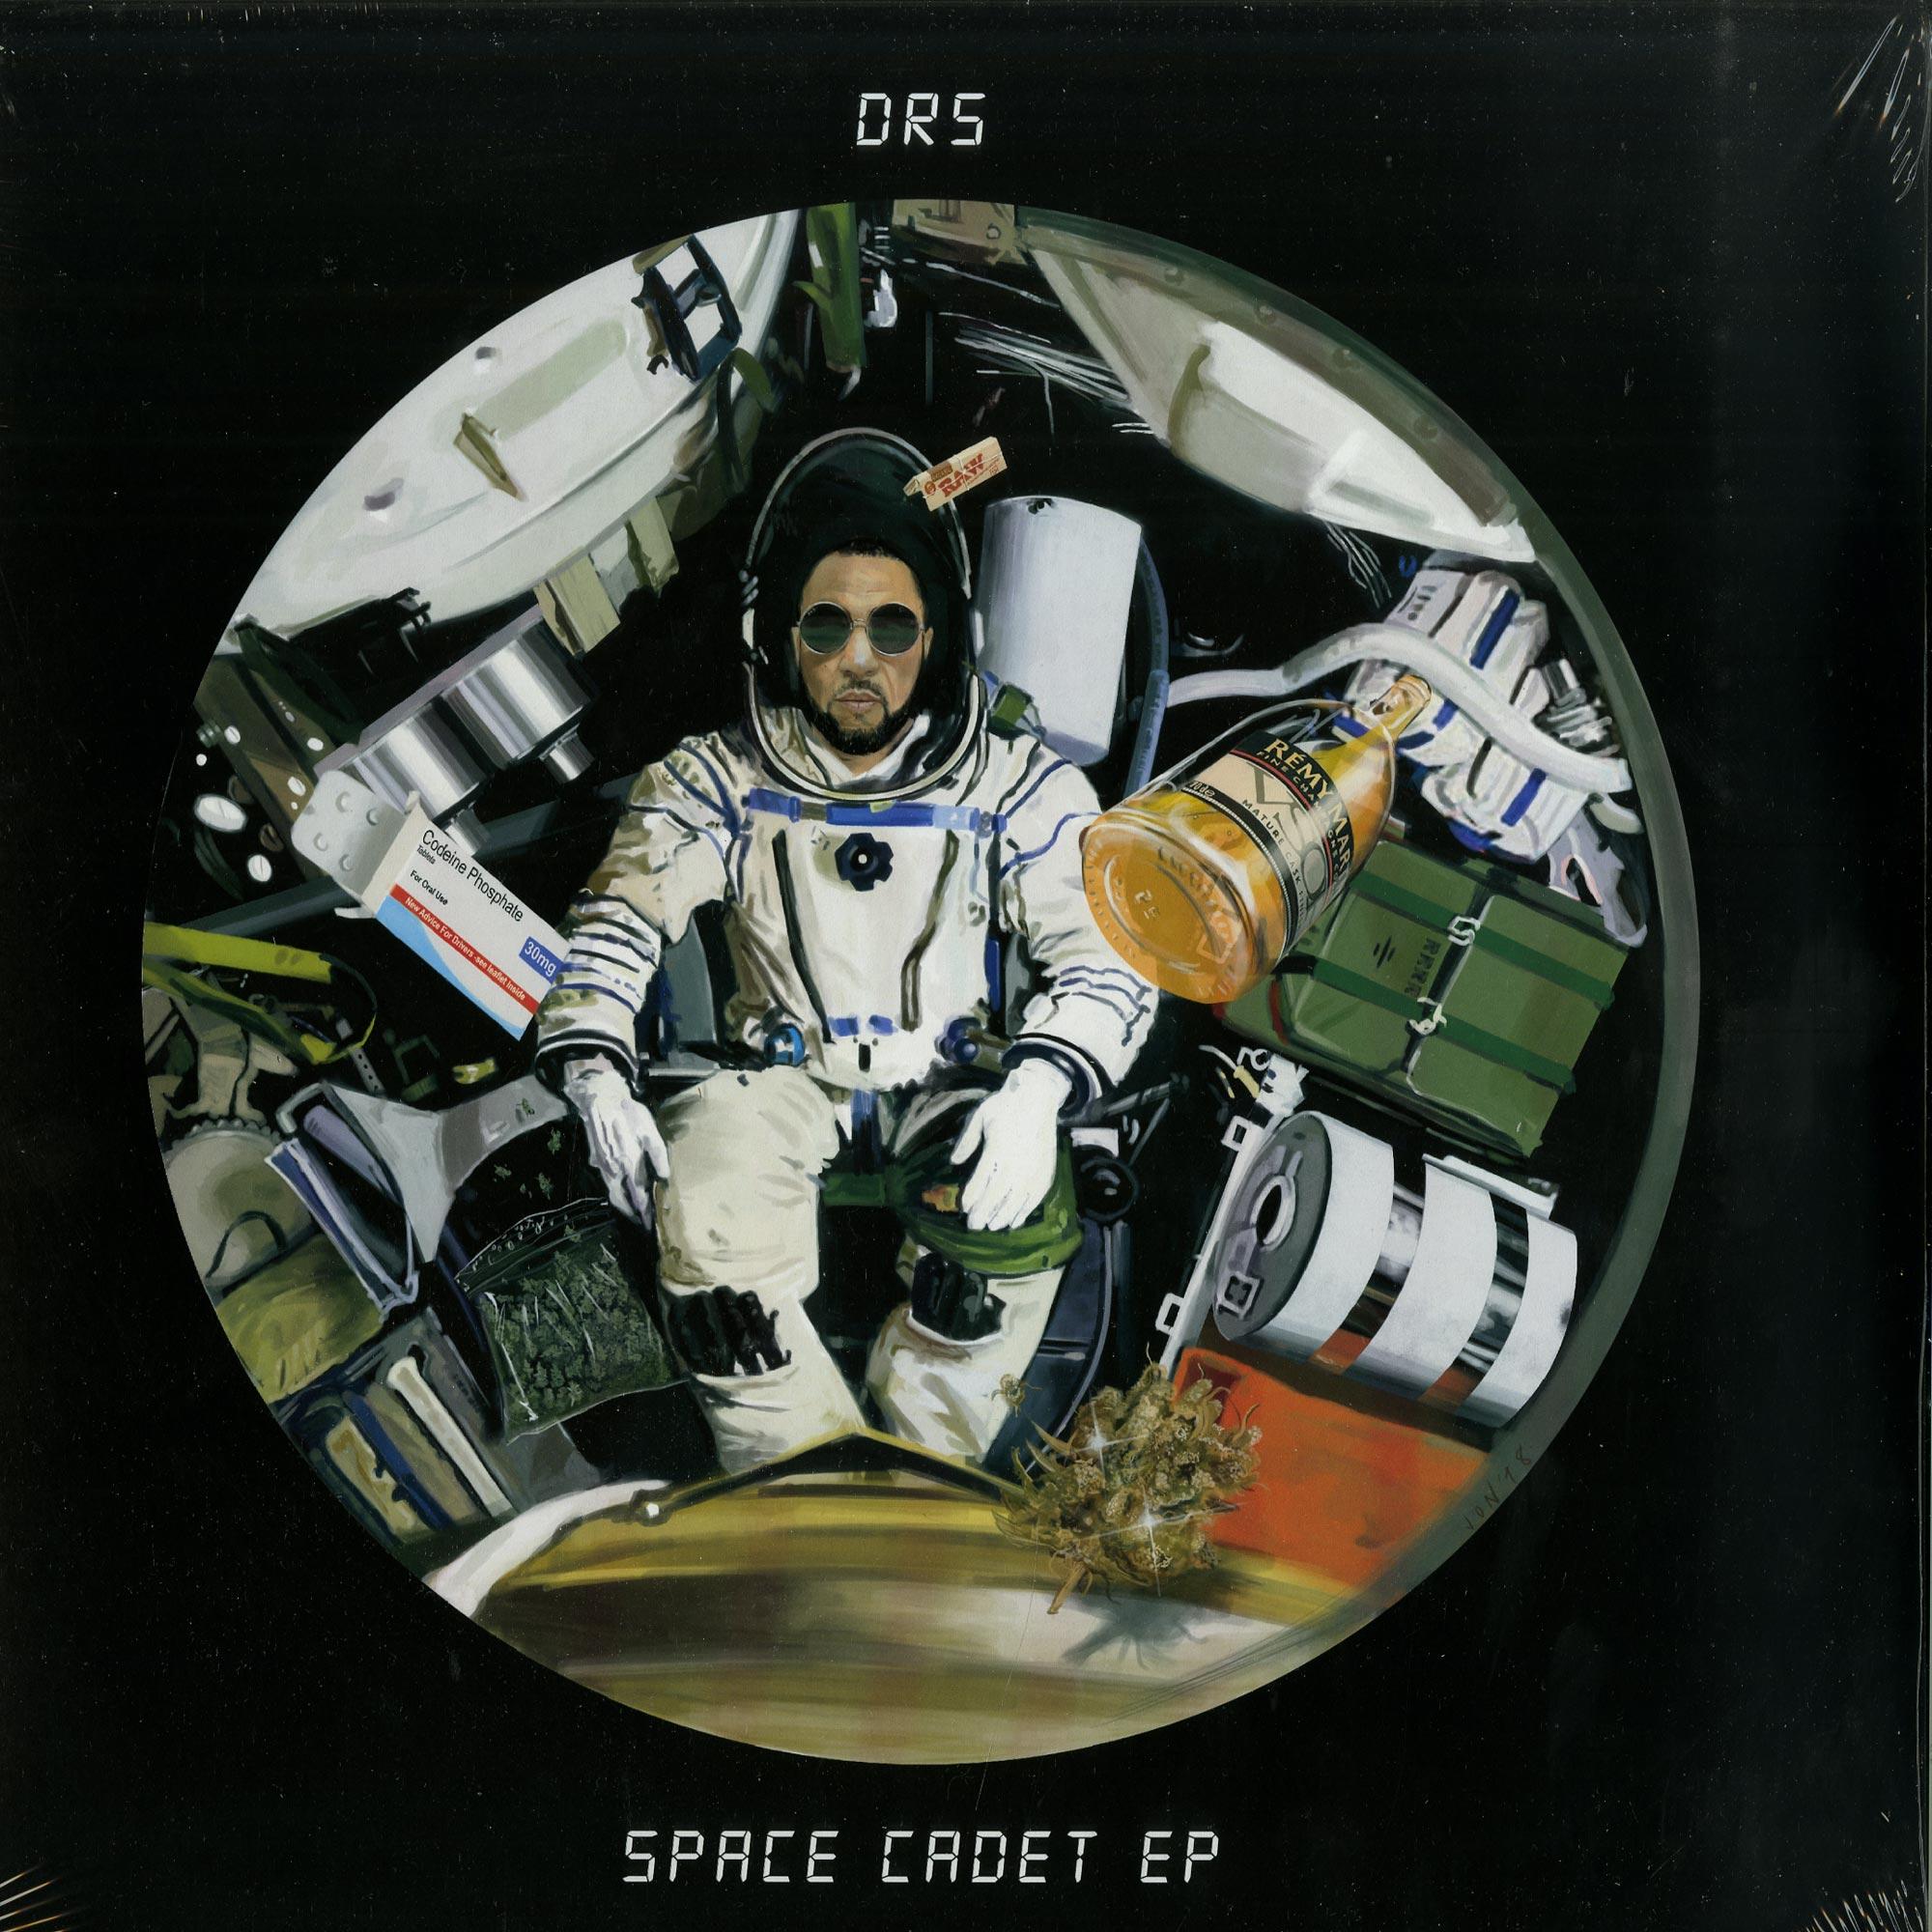 DRS - SPACE CADET EP